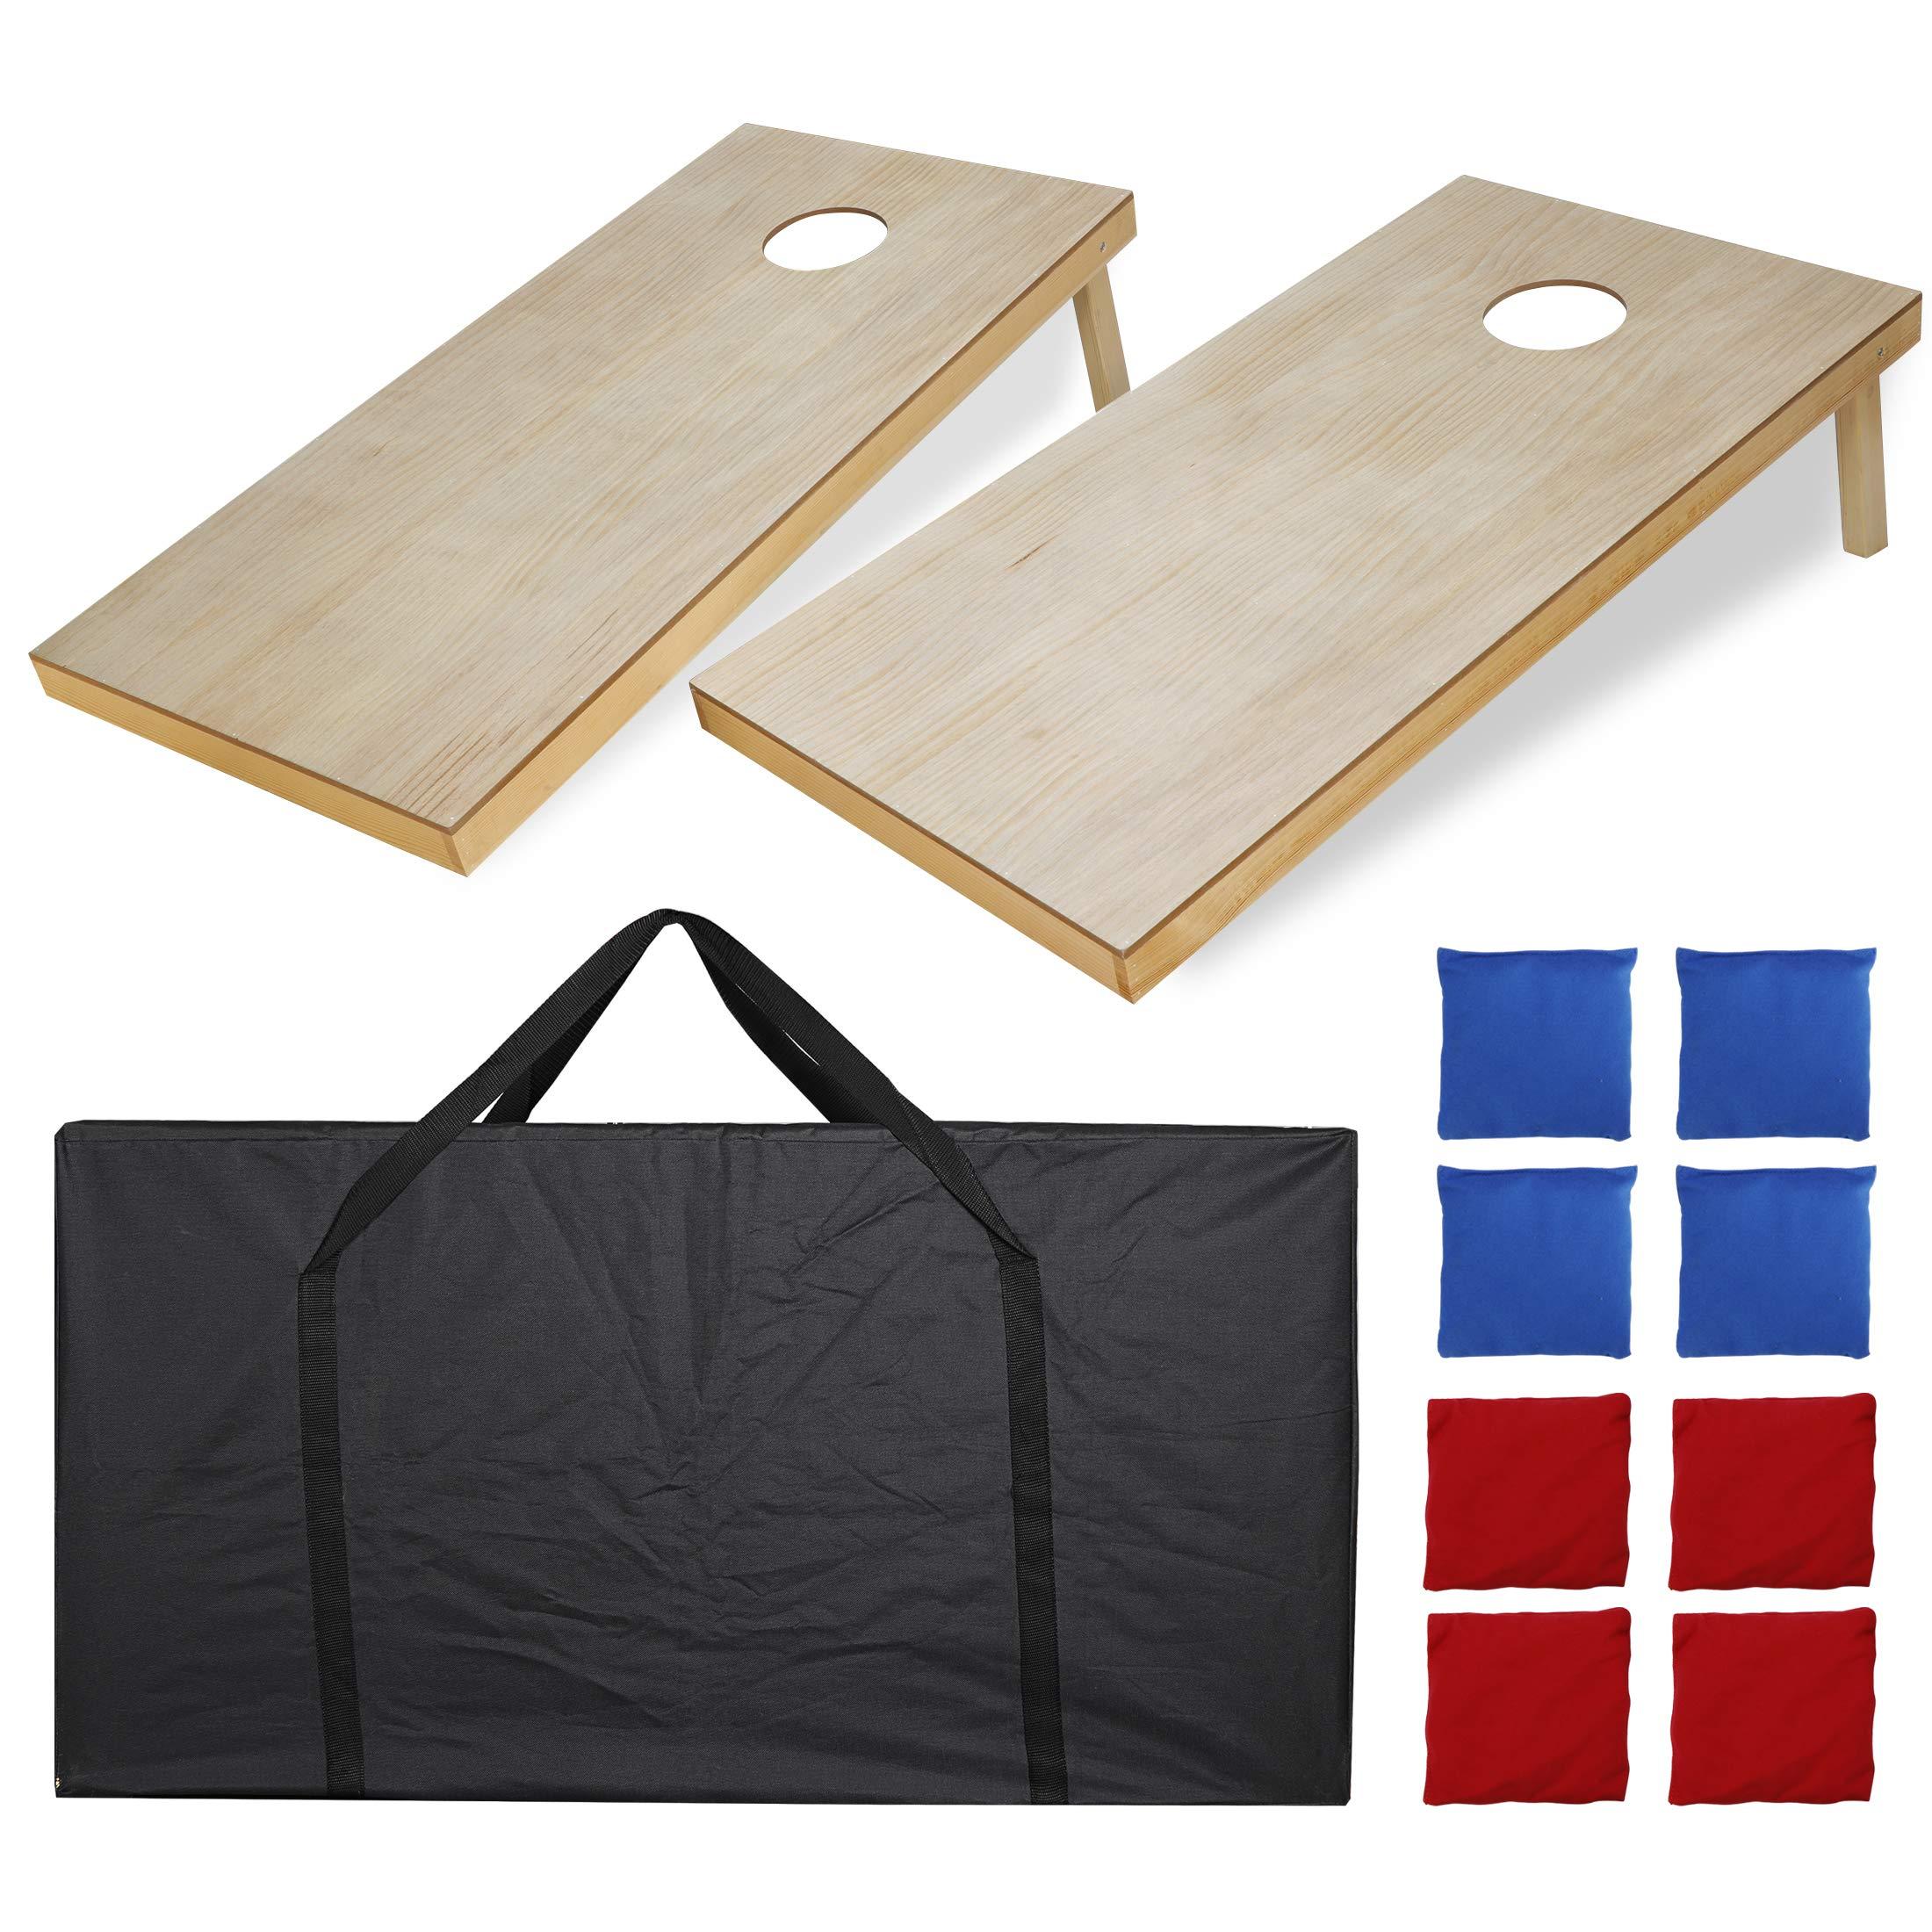 ZENY Portable Wood Cornhole Set Bean Bag Toss Game Set Regulation Size 4'x2' Game Boards & 8 Corn Hole Bean Bags Outdoor Lawn Yard Games